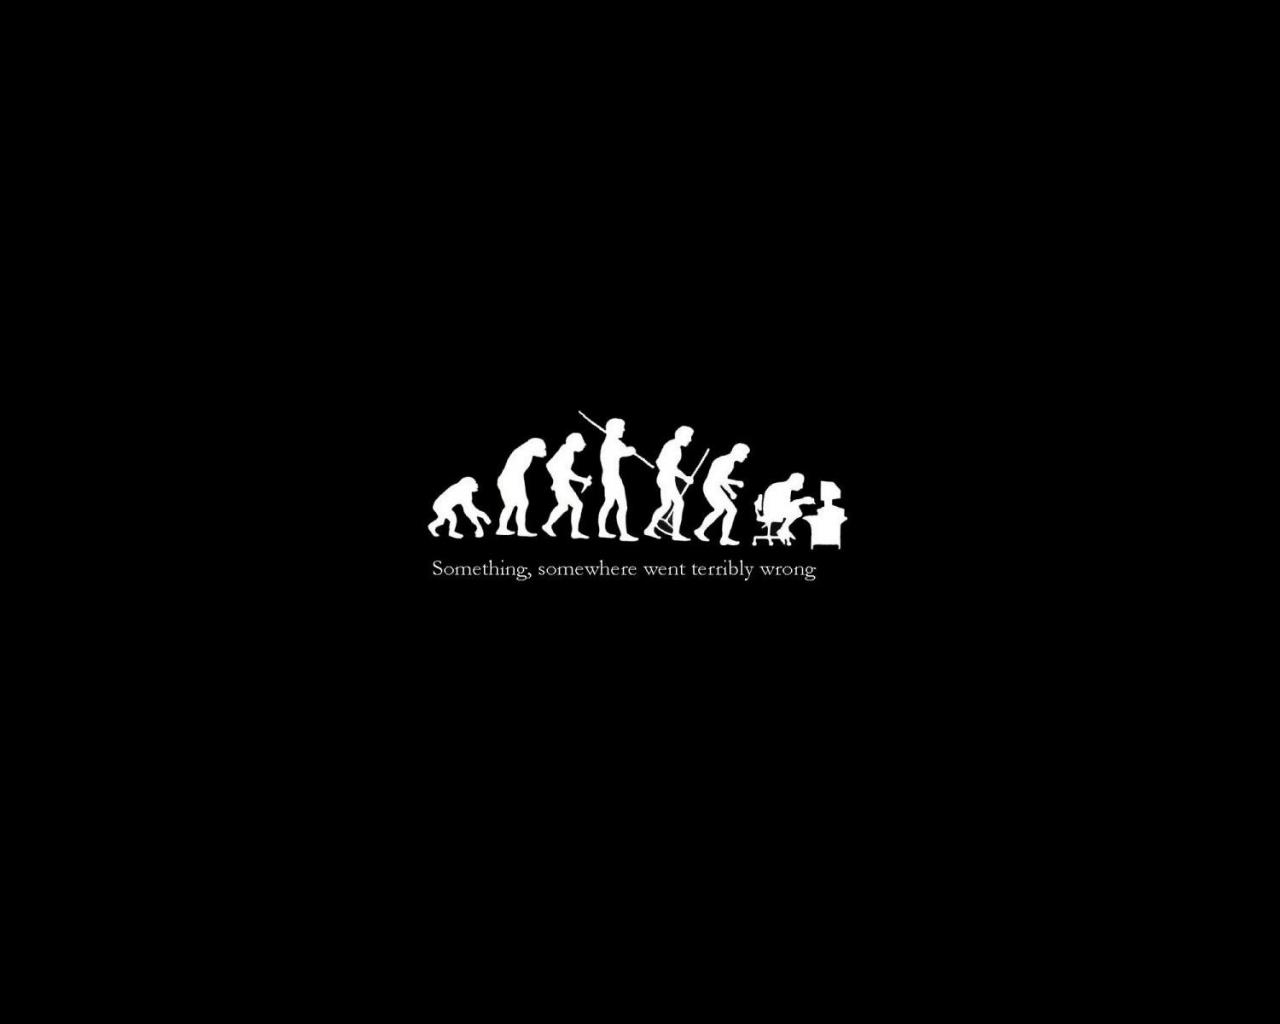 Human evolution Gaming Funny Evolution HD Wallpapers, Desktop